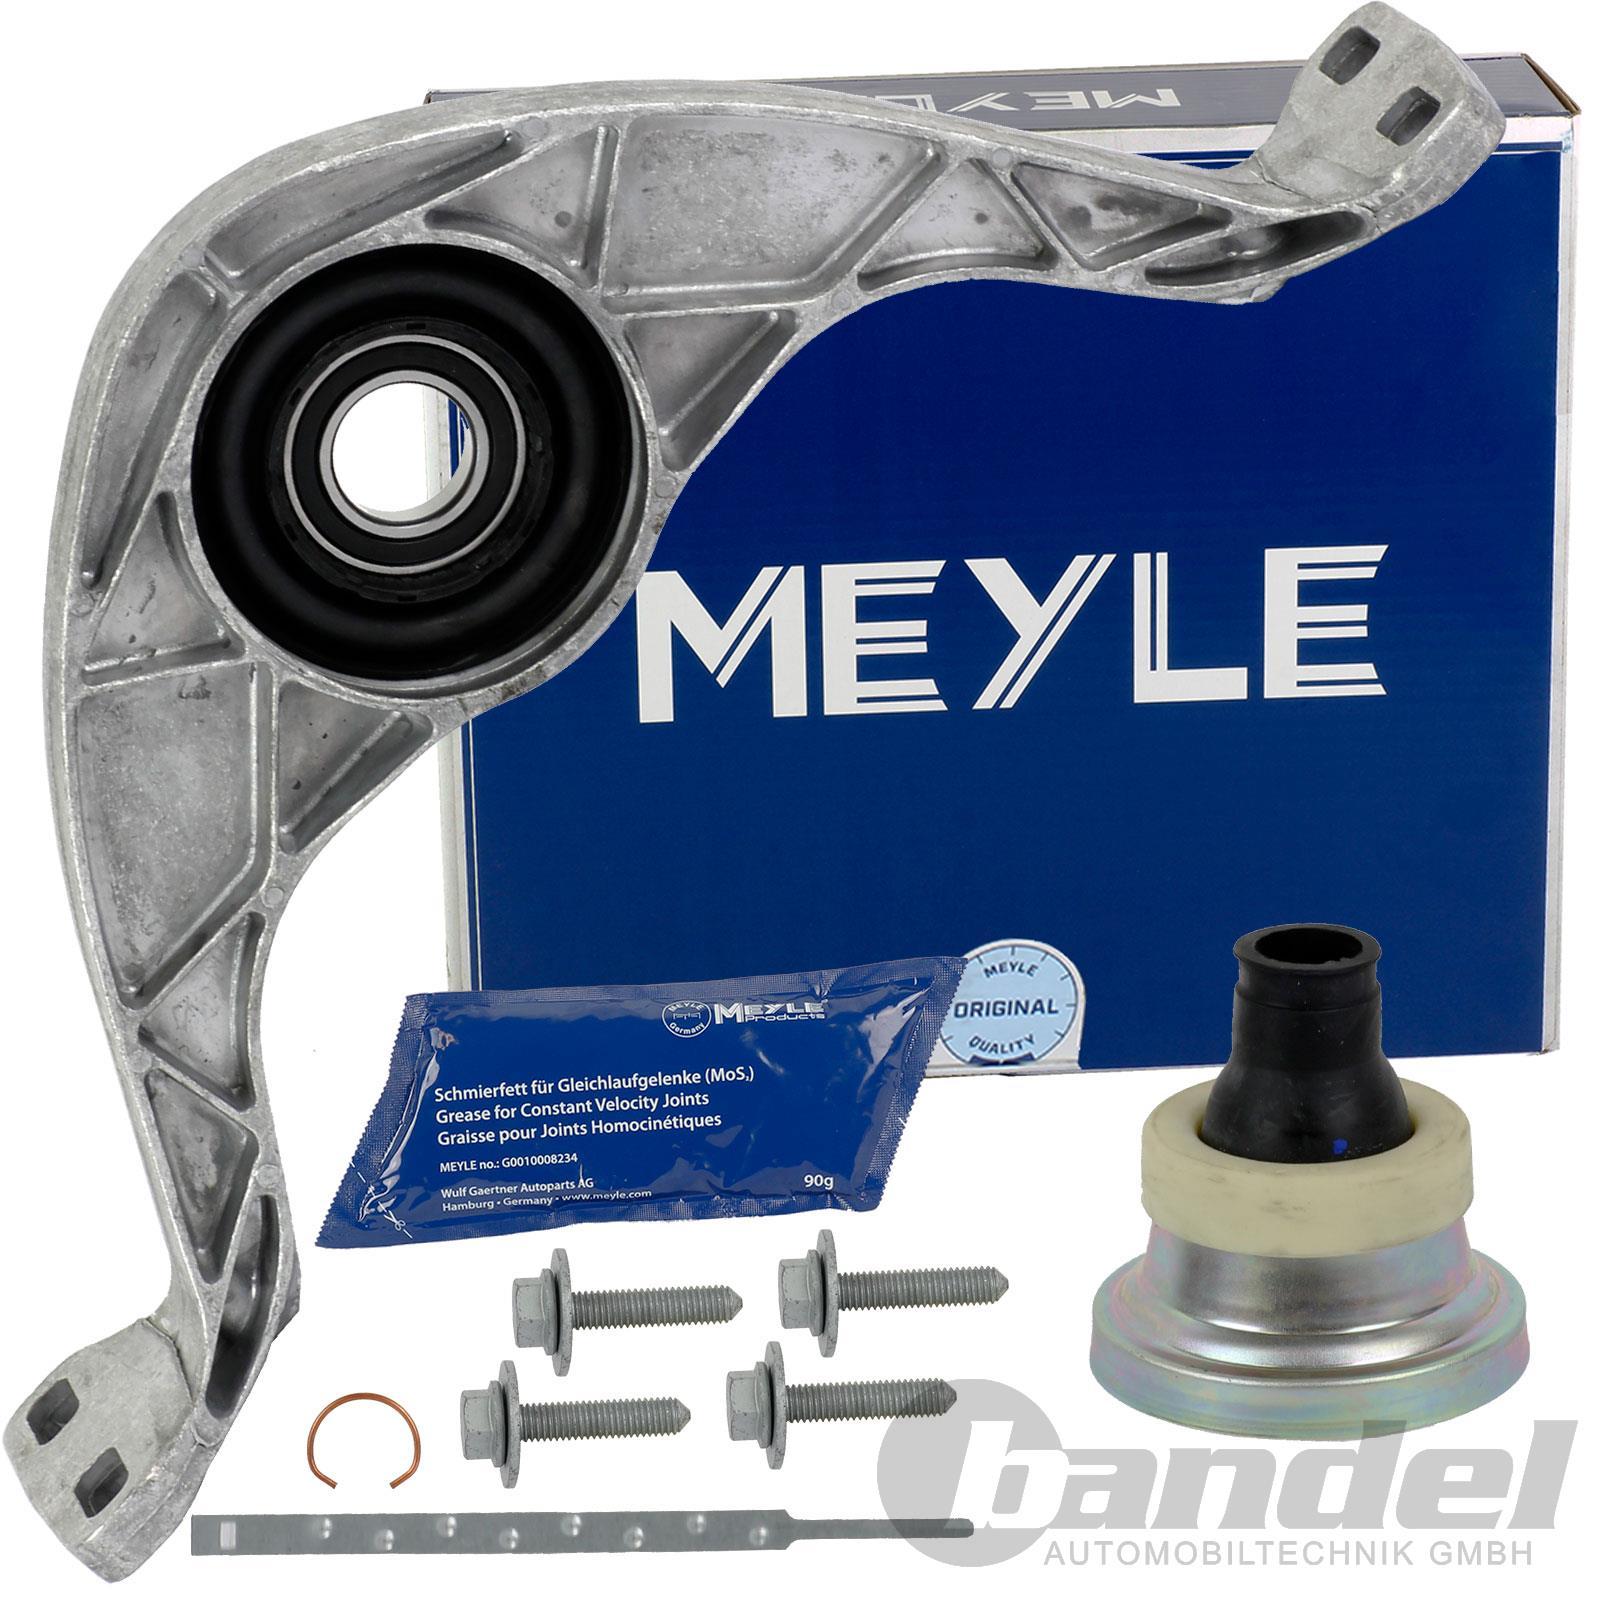 MEYLE Lagerung Automatikgetriebe MEYLE-ORIGINAL Quality 300 247 1100